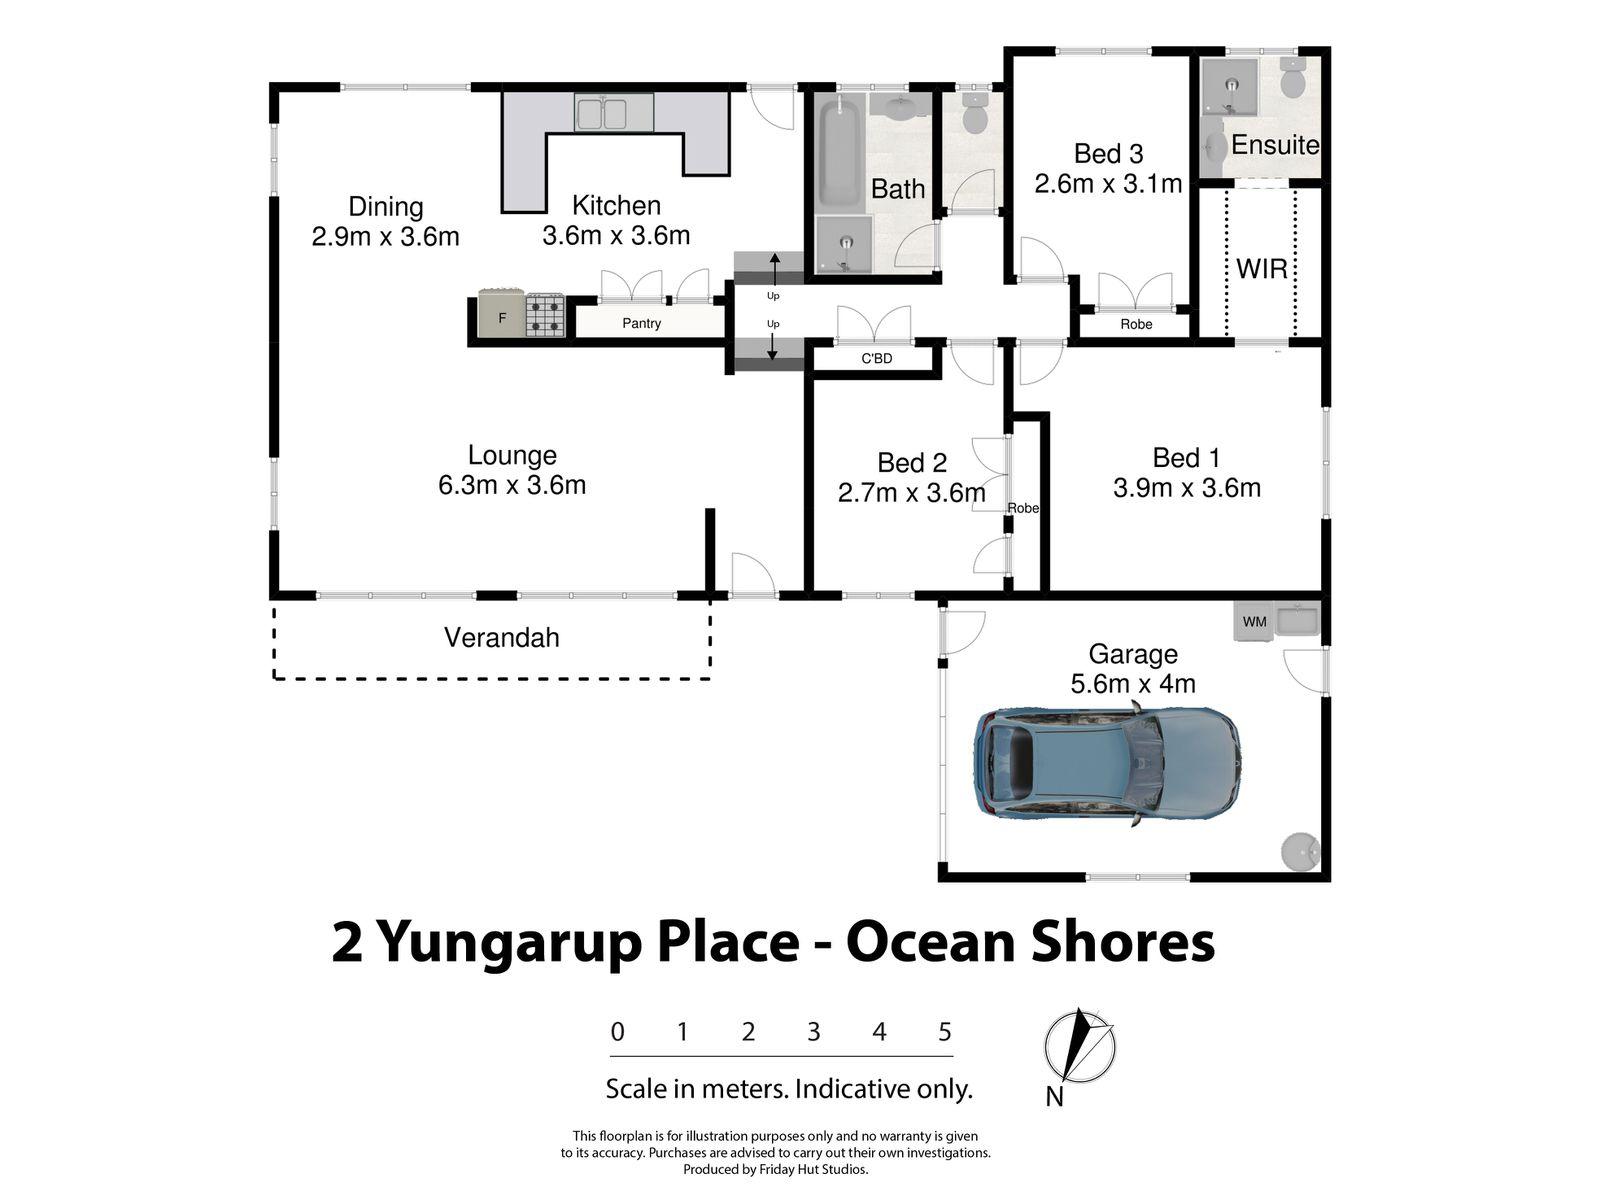 2 Yungarup Place, Ocean Shores